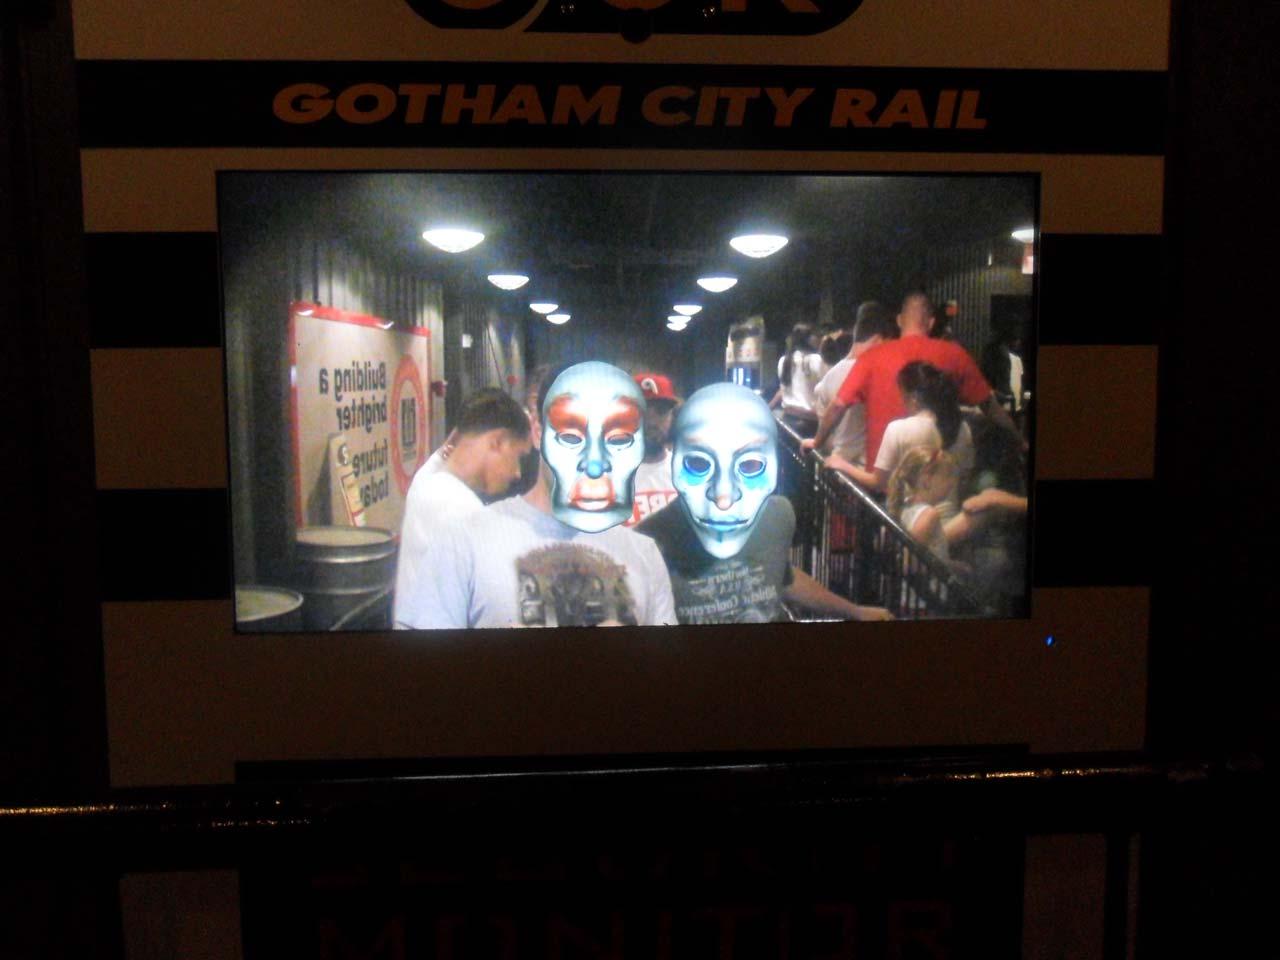 Gotham City Rail